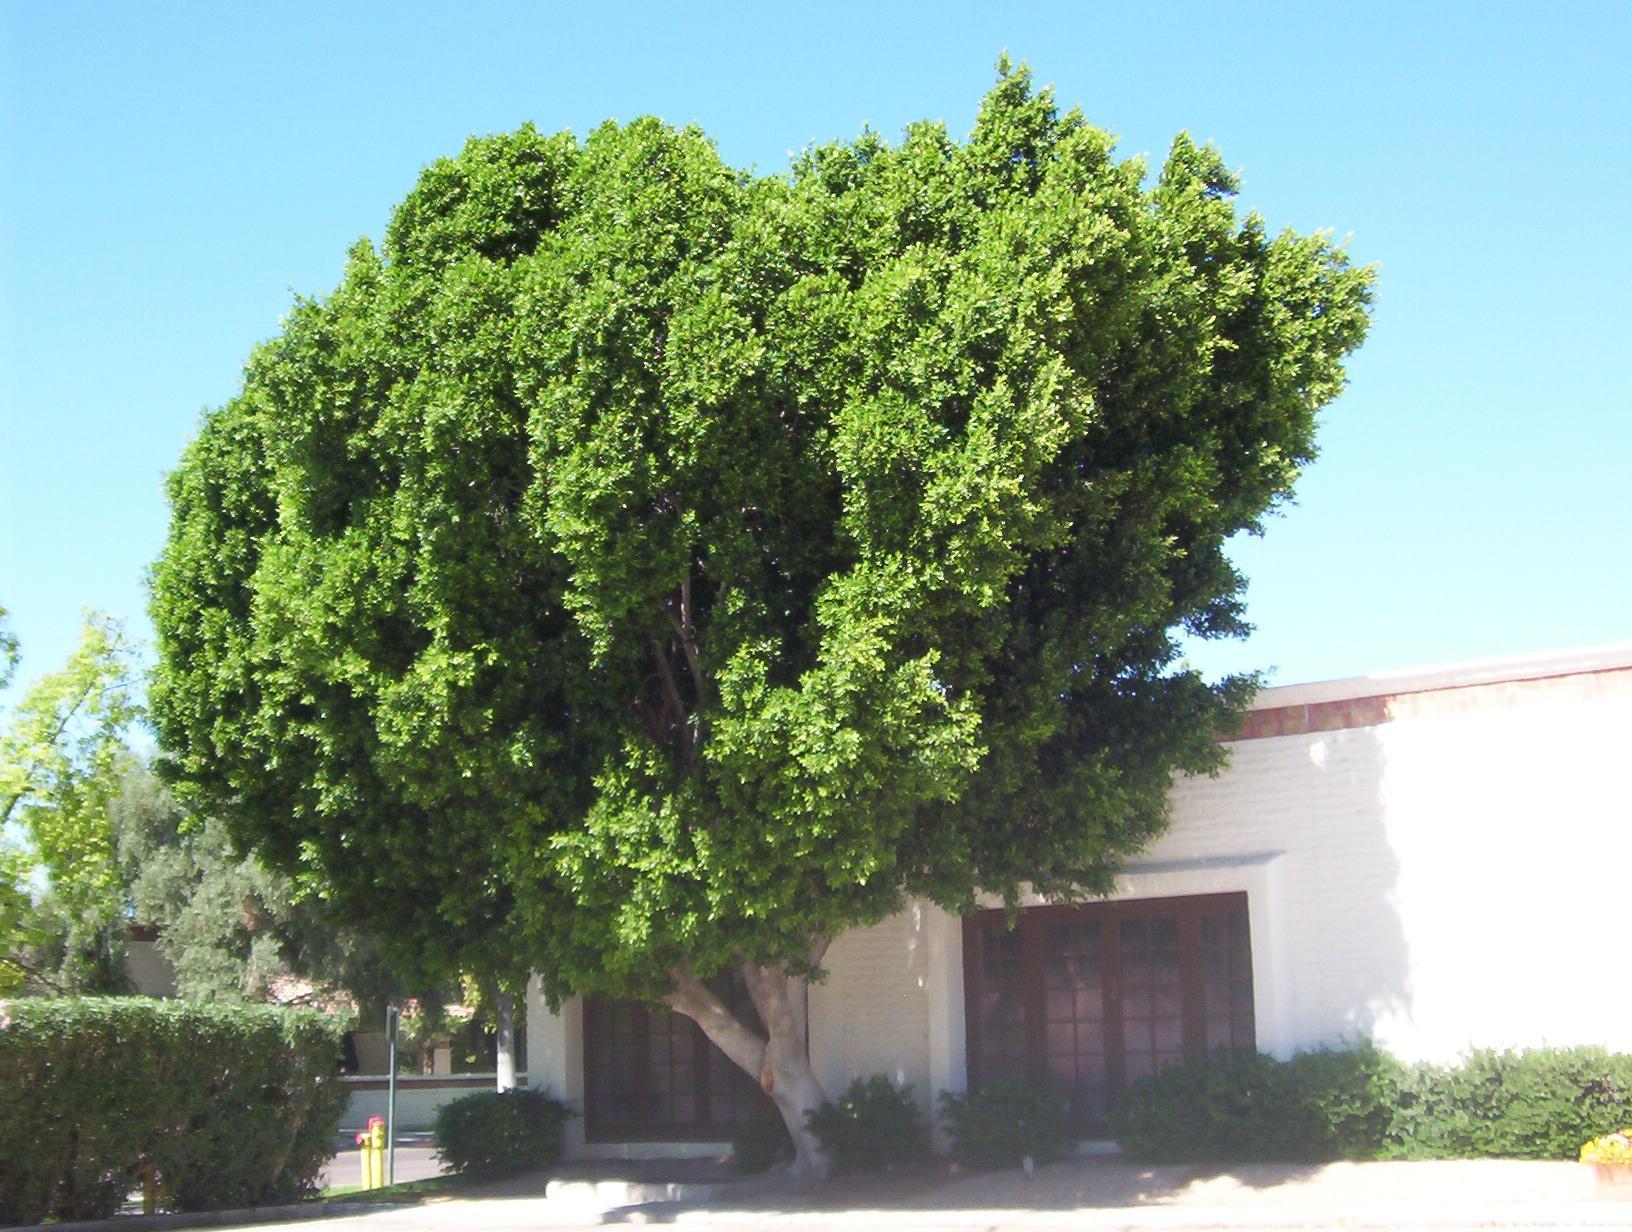 Ficus Nitida East Los Angeles Dirigible Air Transport Lines